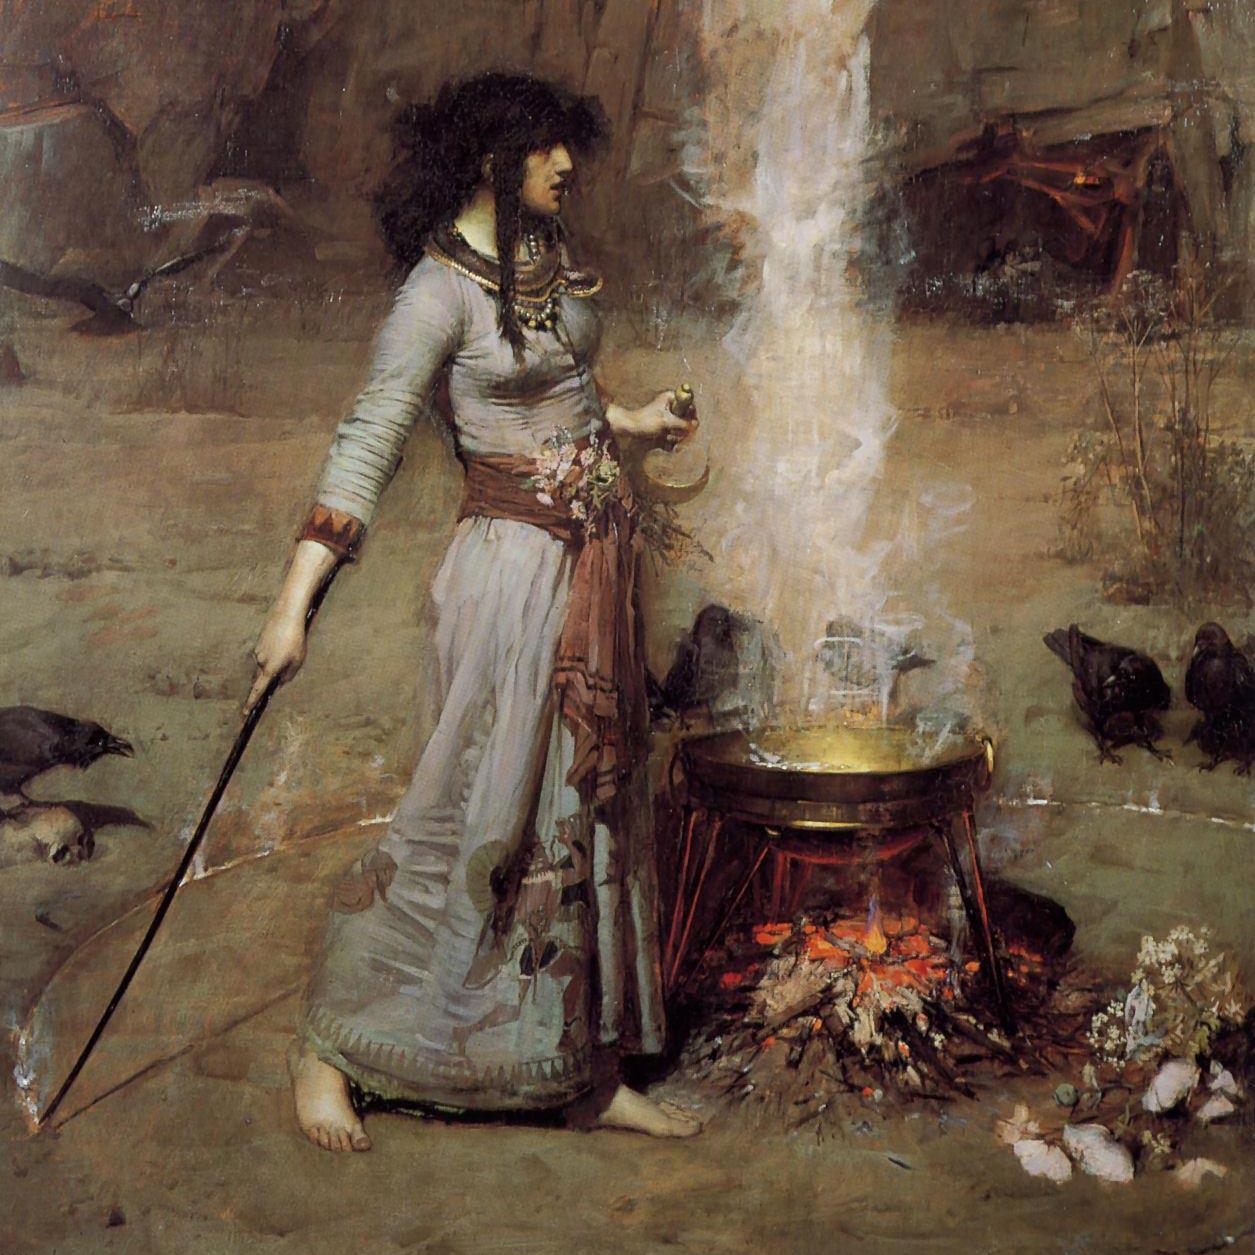 Magic Circle  by John William Waterhouse, 1886.